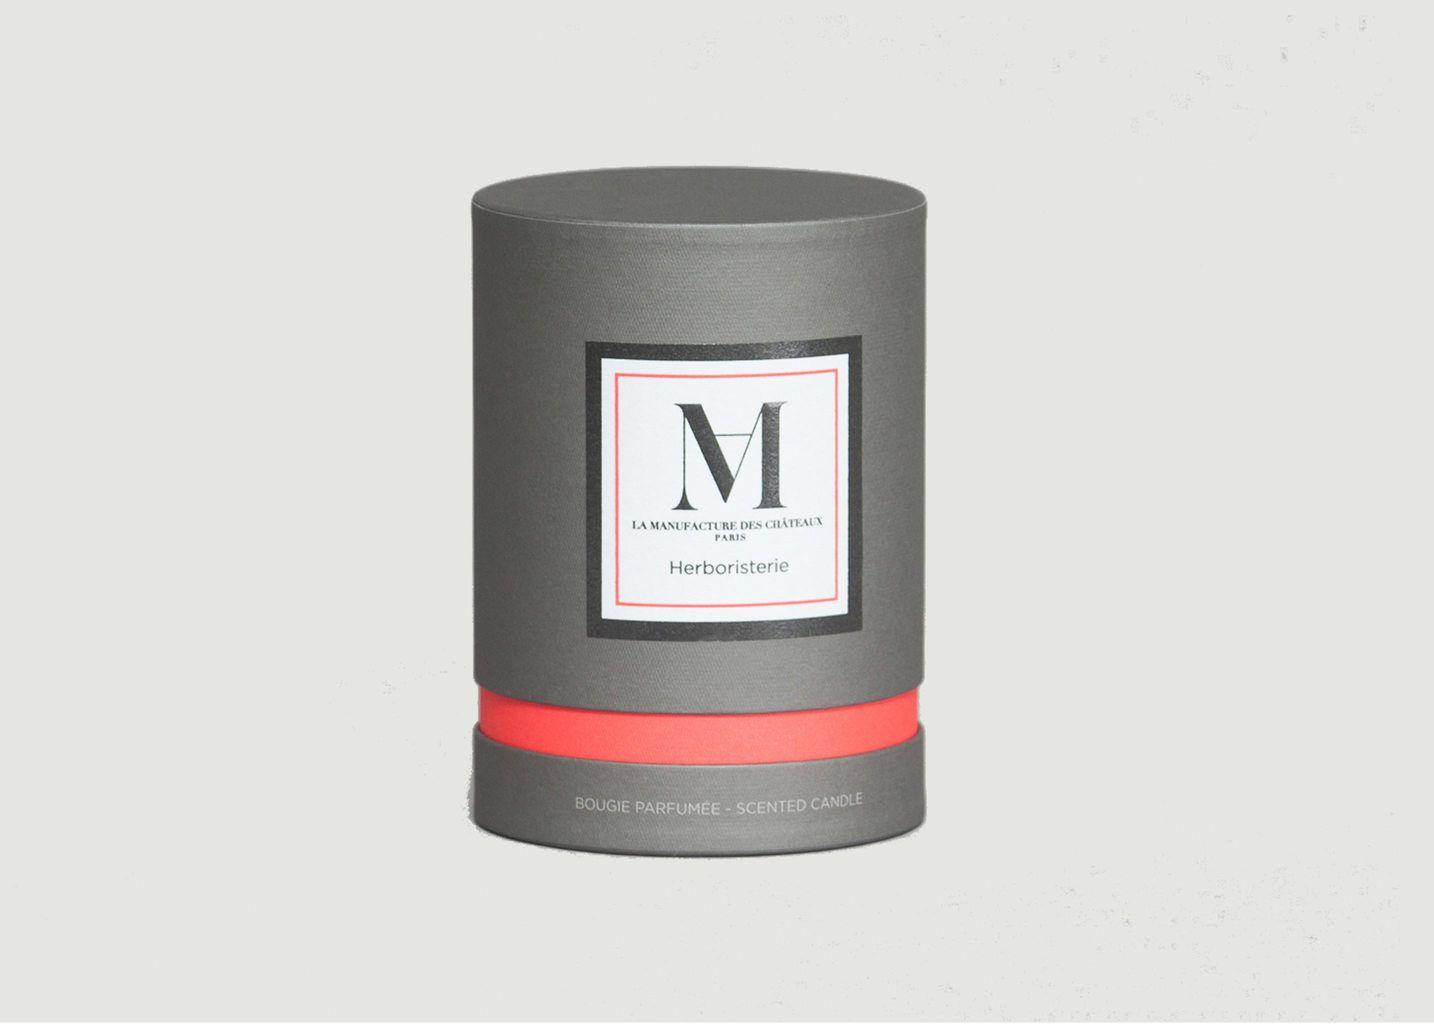 Bougie Herboristerie - La Manufacture Parfums